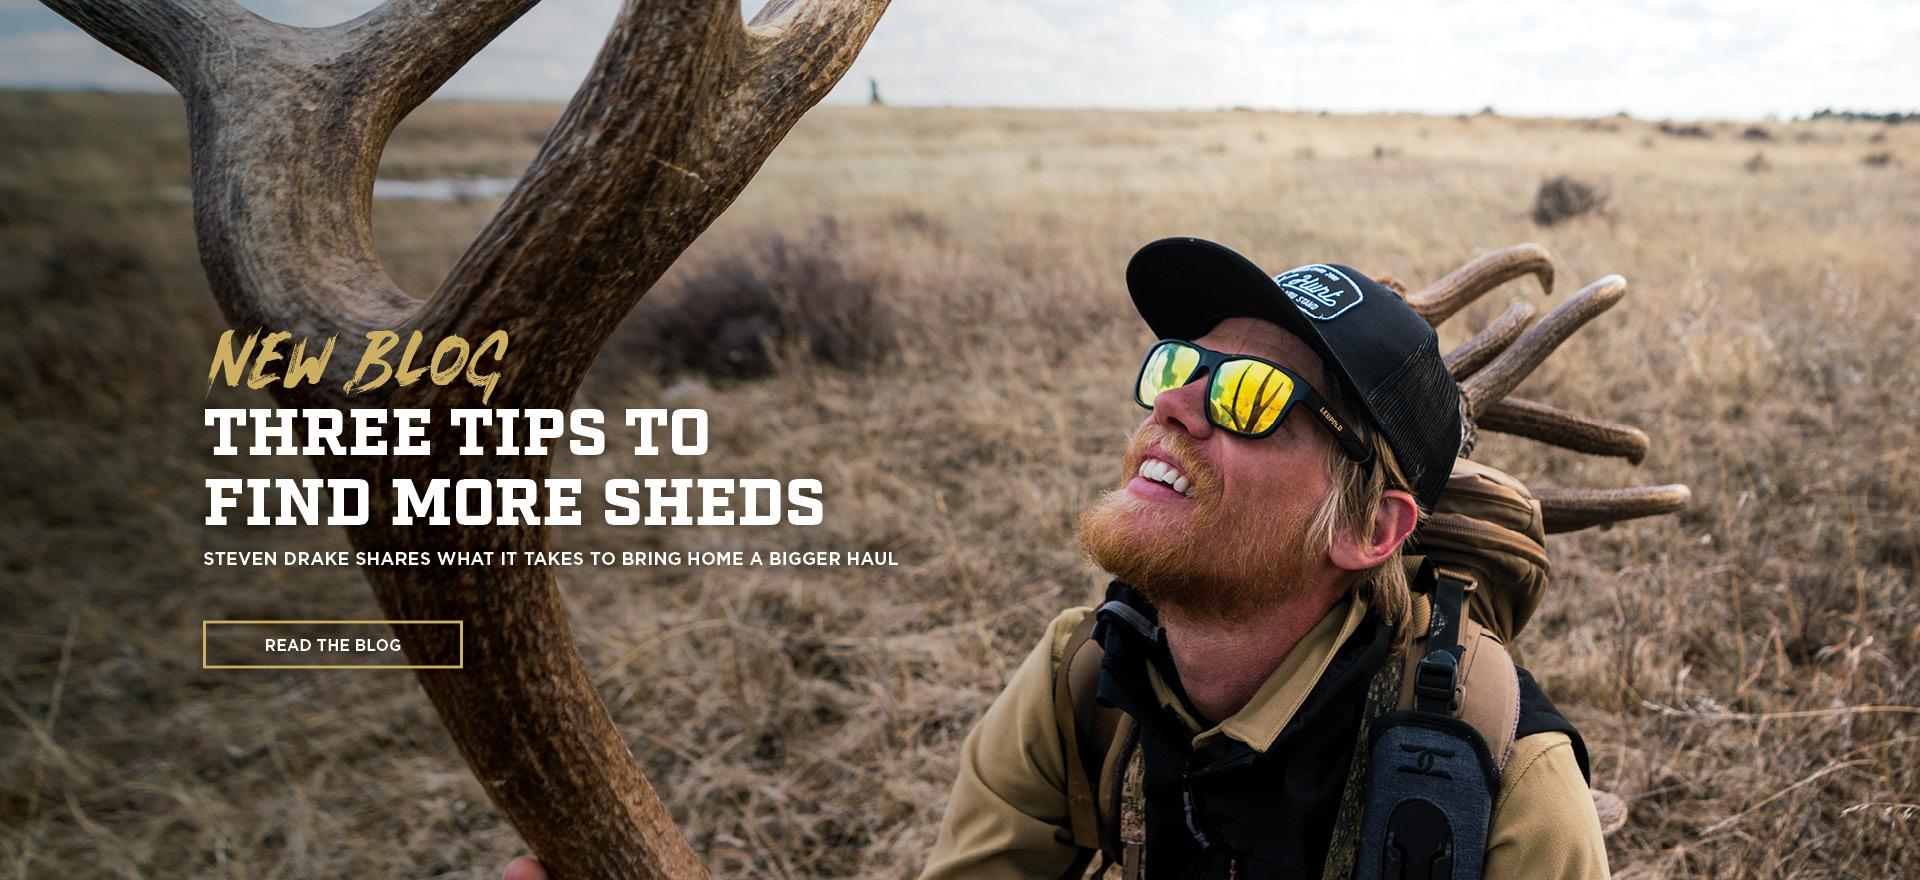 Blog: Shed Hunting Tips